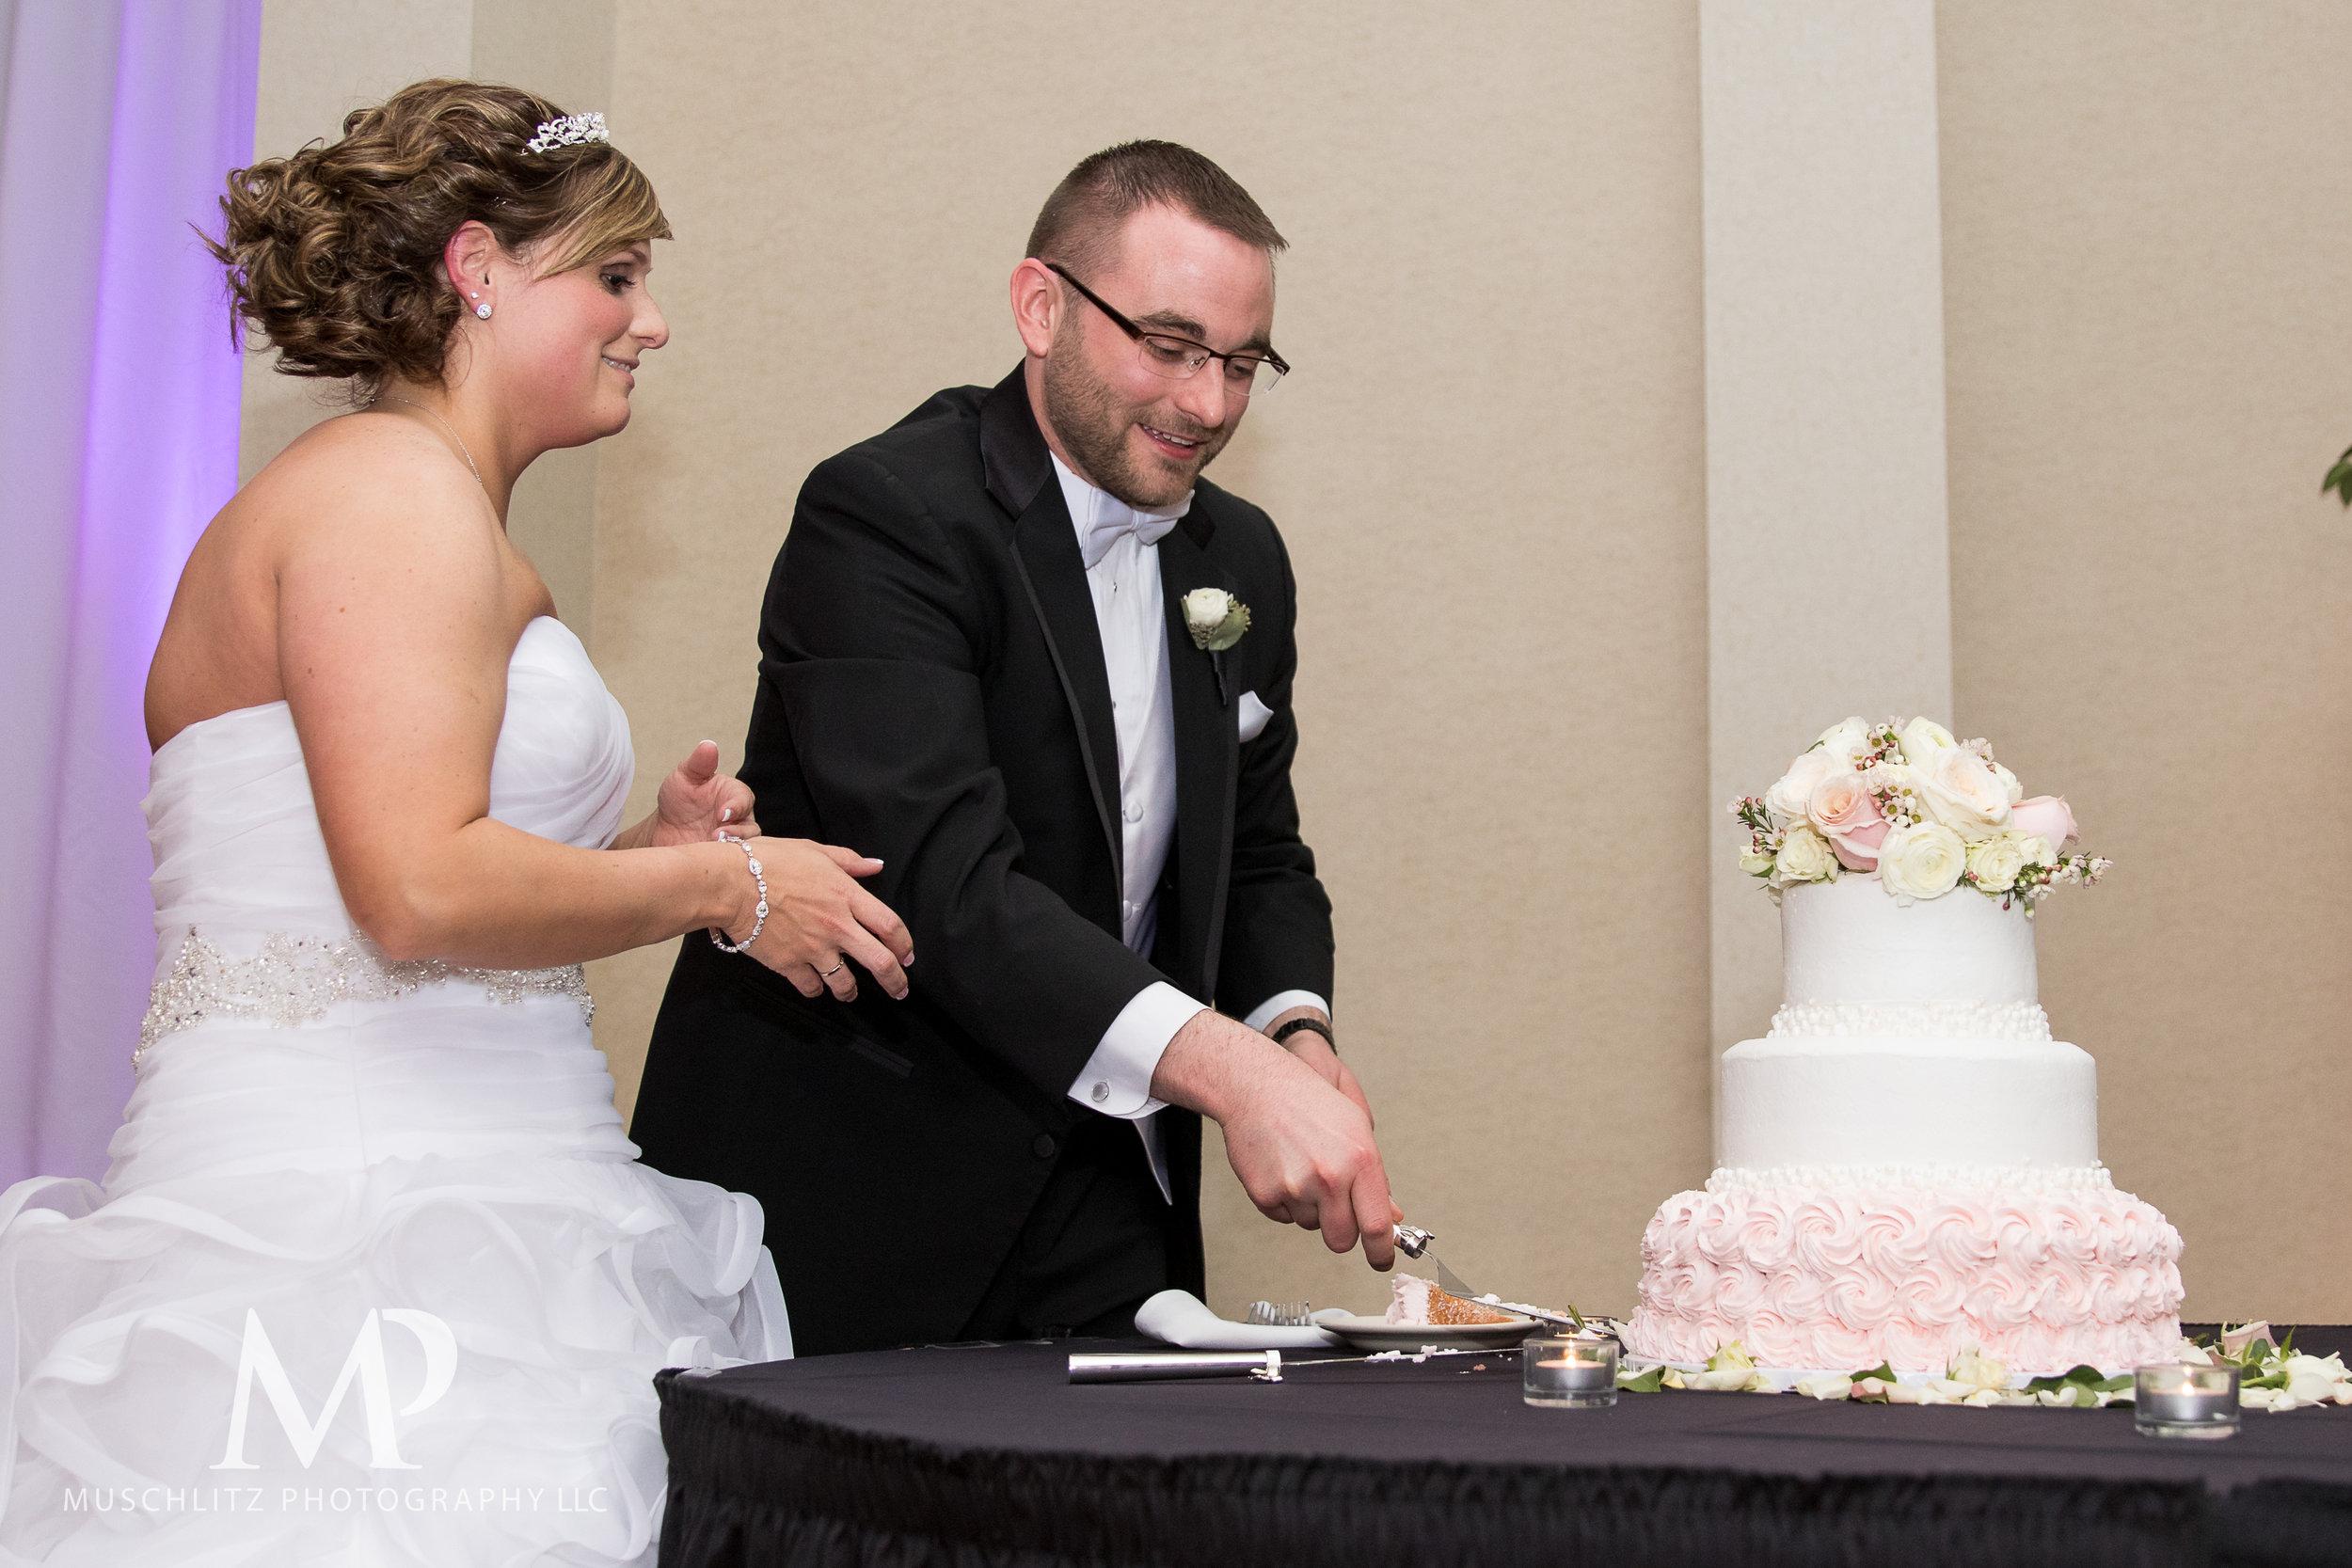 annunciation-banquet-conference-center-downtown-columbus-wedding-reception-downtown-columbus-ohio-muschlitz-photography-013.JPG